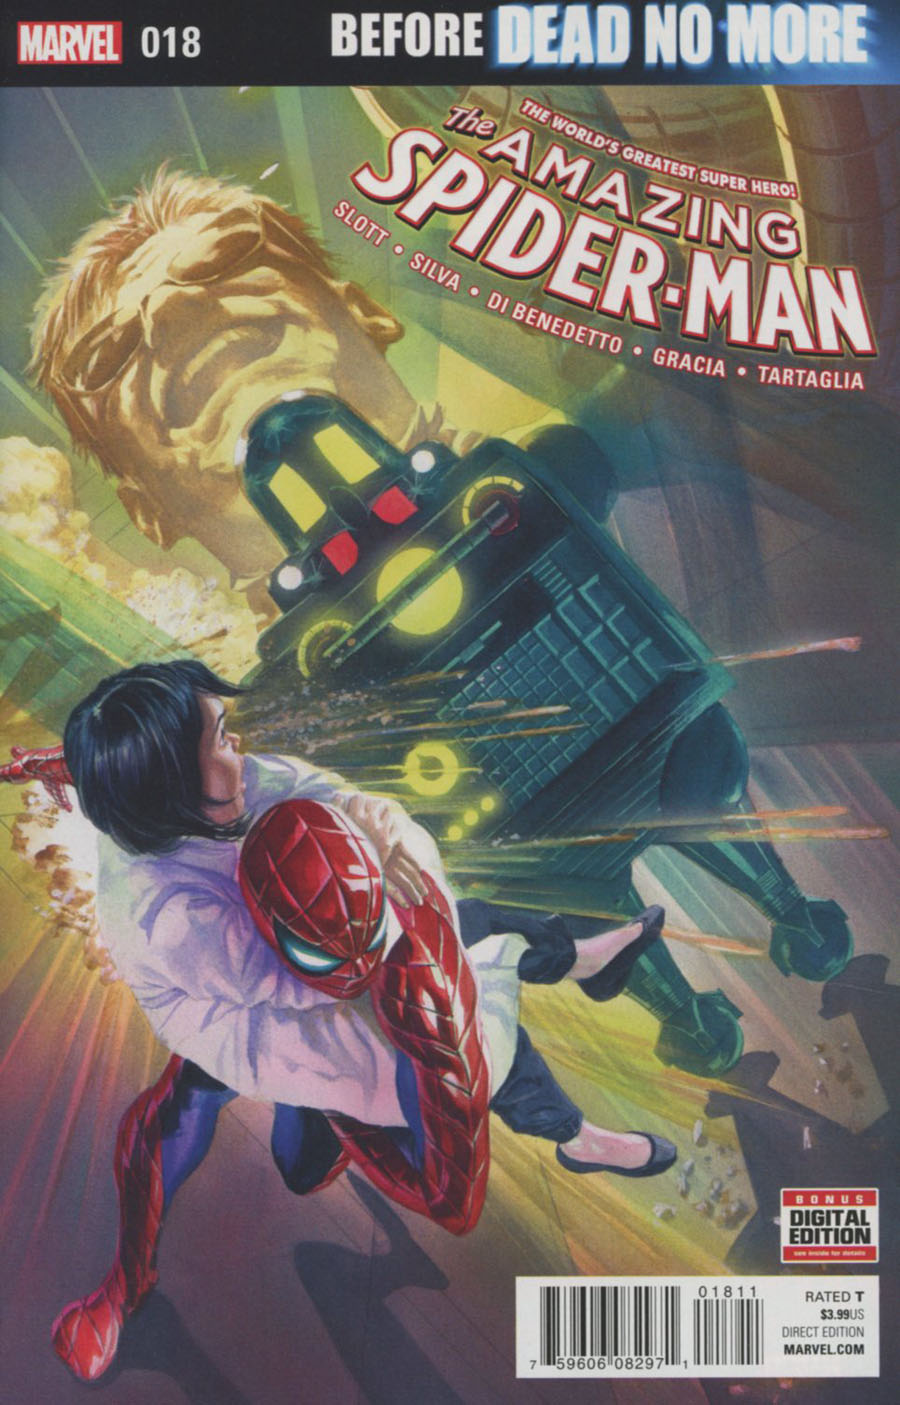 Amazing Spider-Man Vol 4 #18 Cover A Regular Alex Ross Cover (Dead No More Prelude)